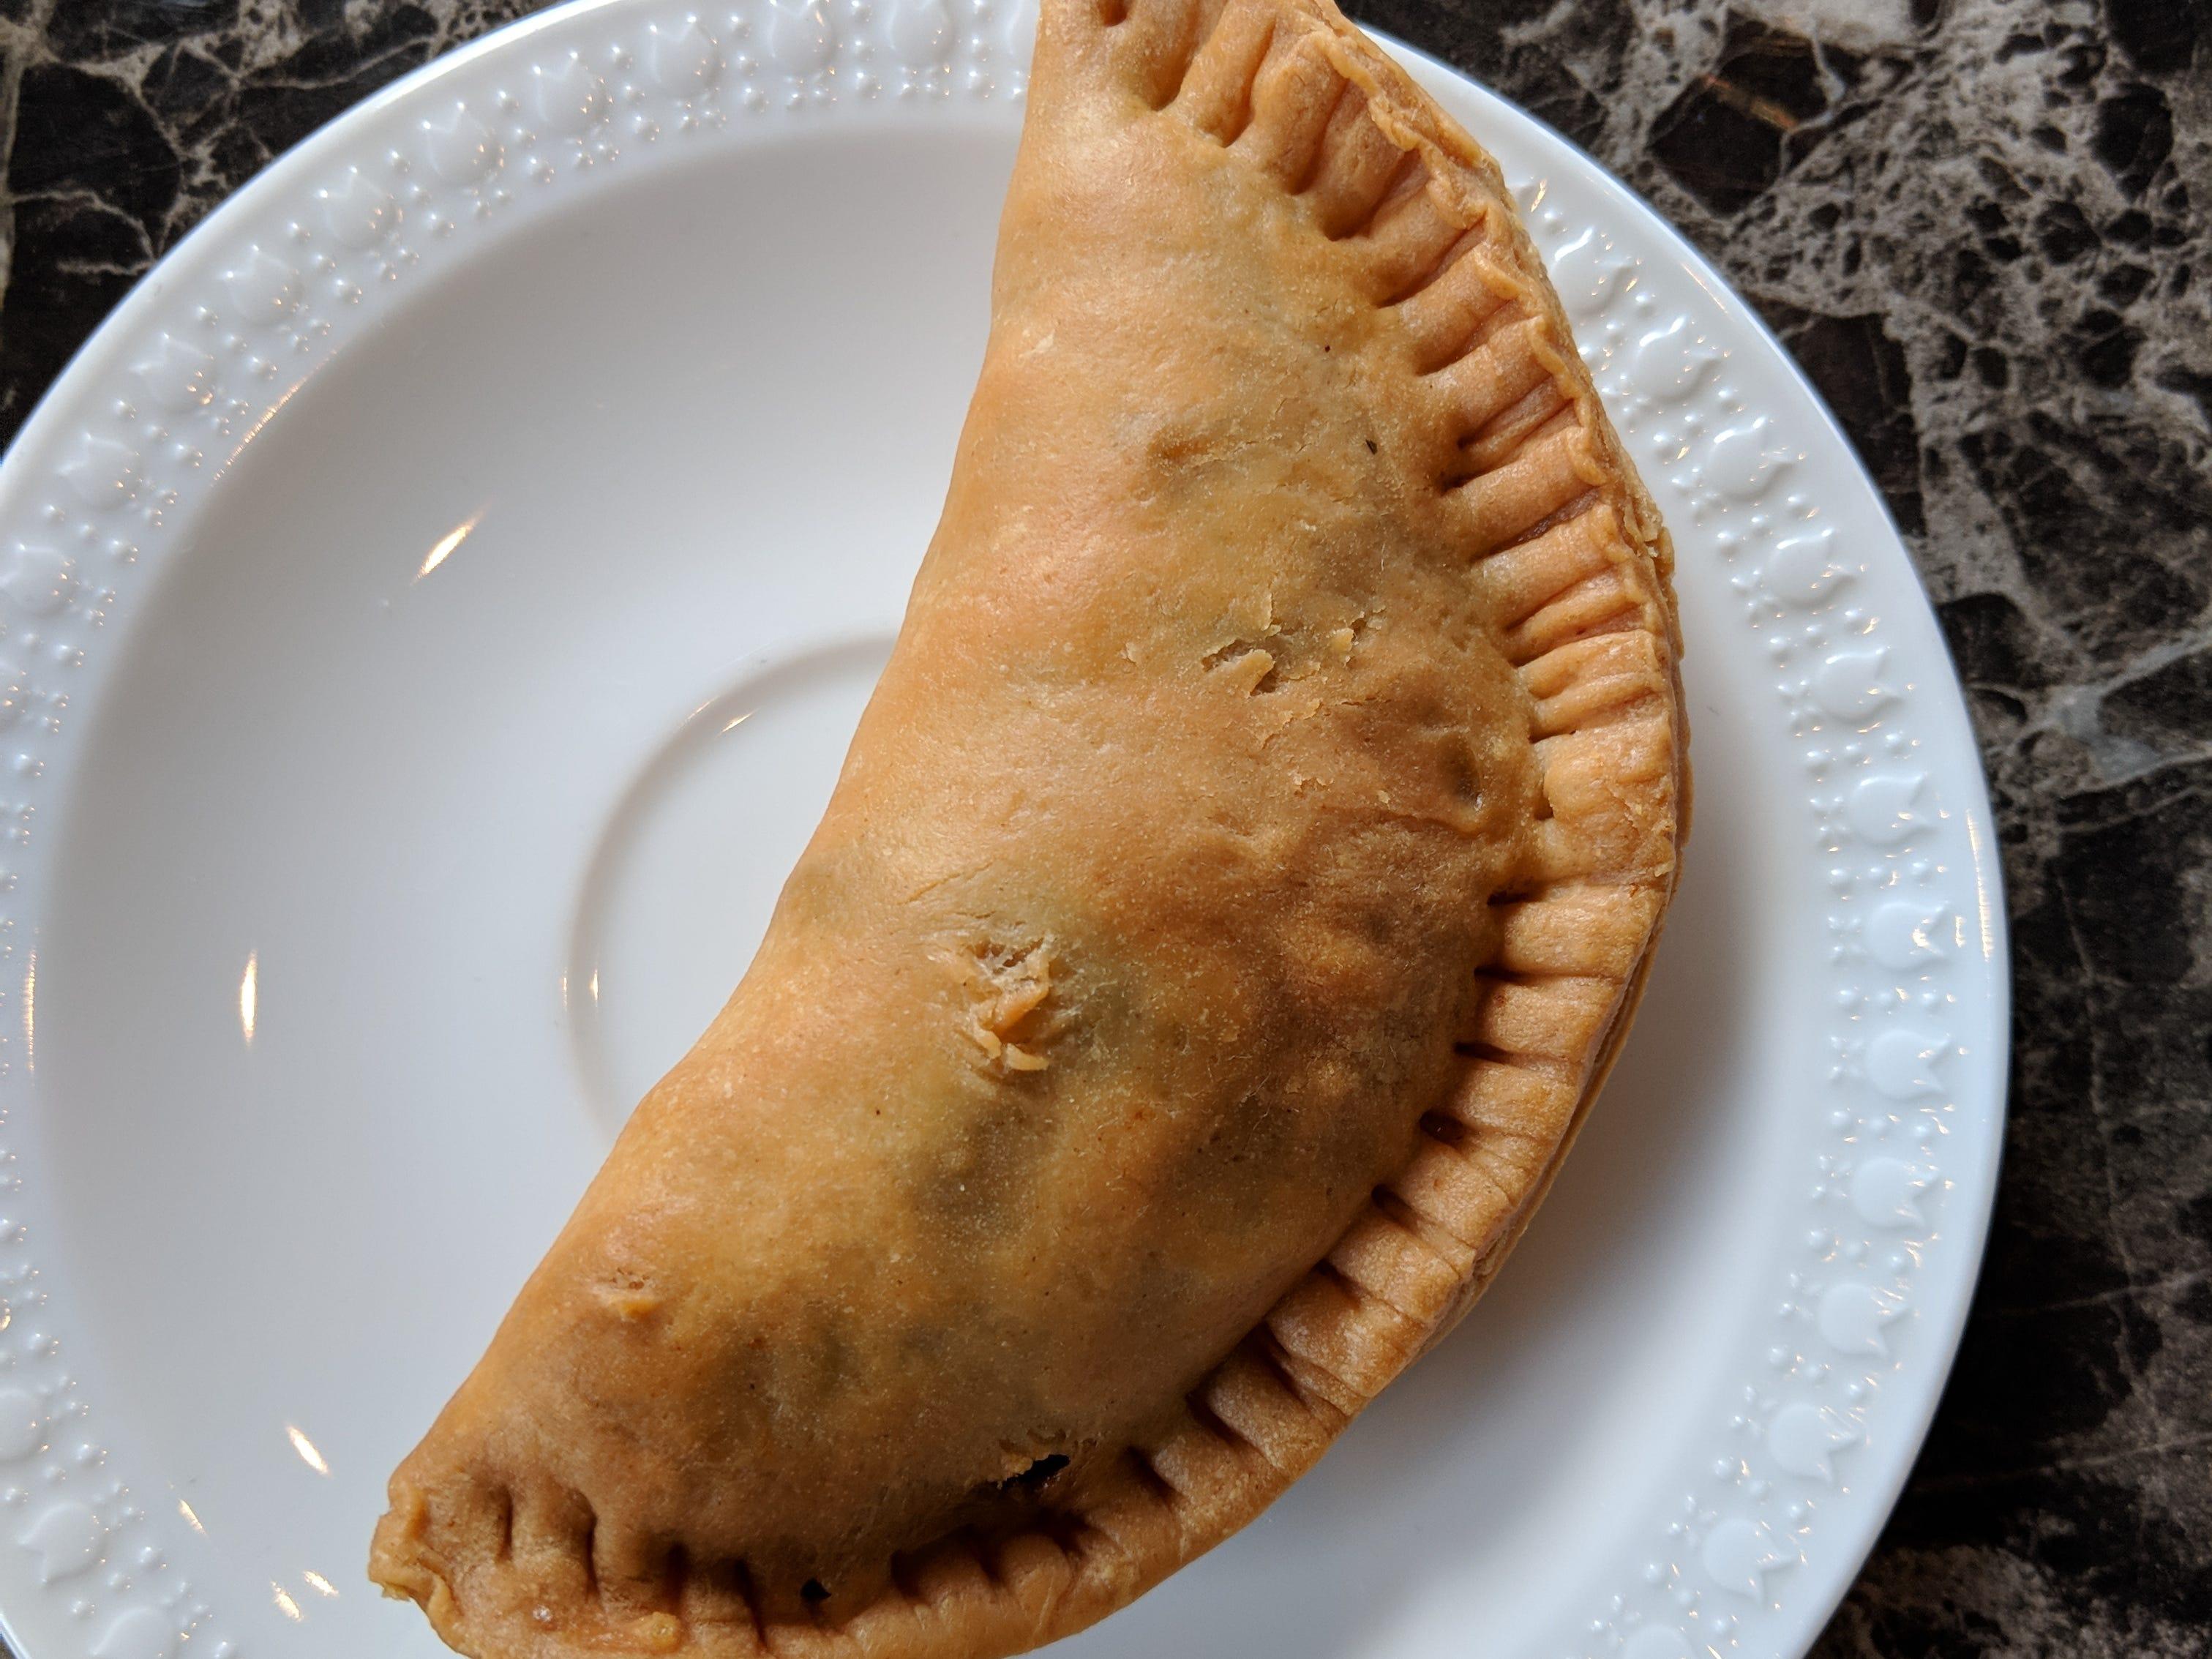 A chicken empanada.